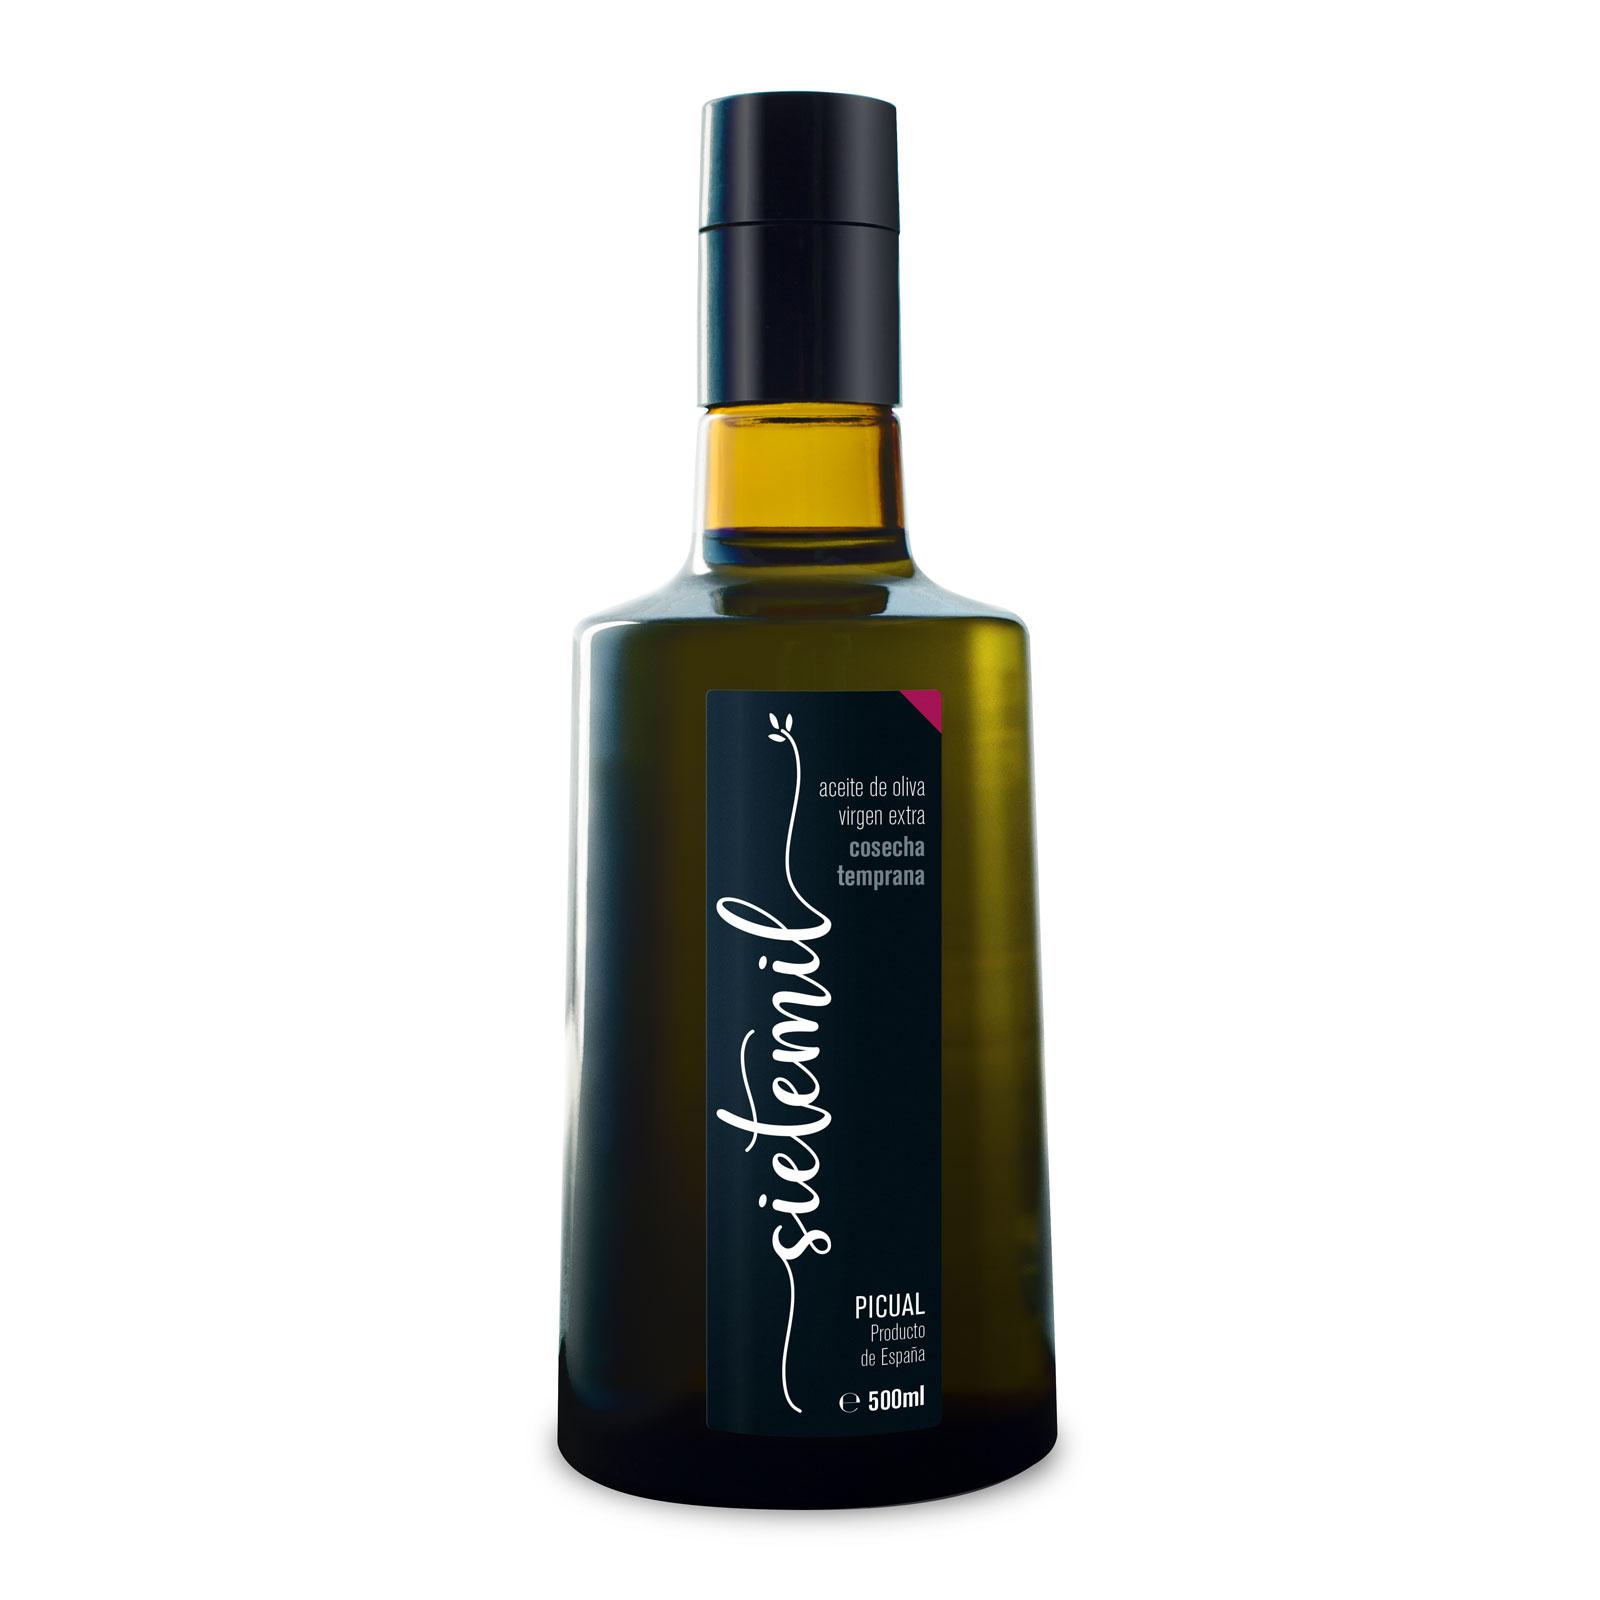 Aceite de Oliva Virgen Extra Sietemil Cosecha Temprana 500ml